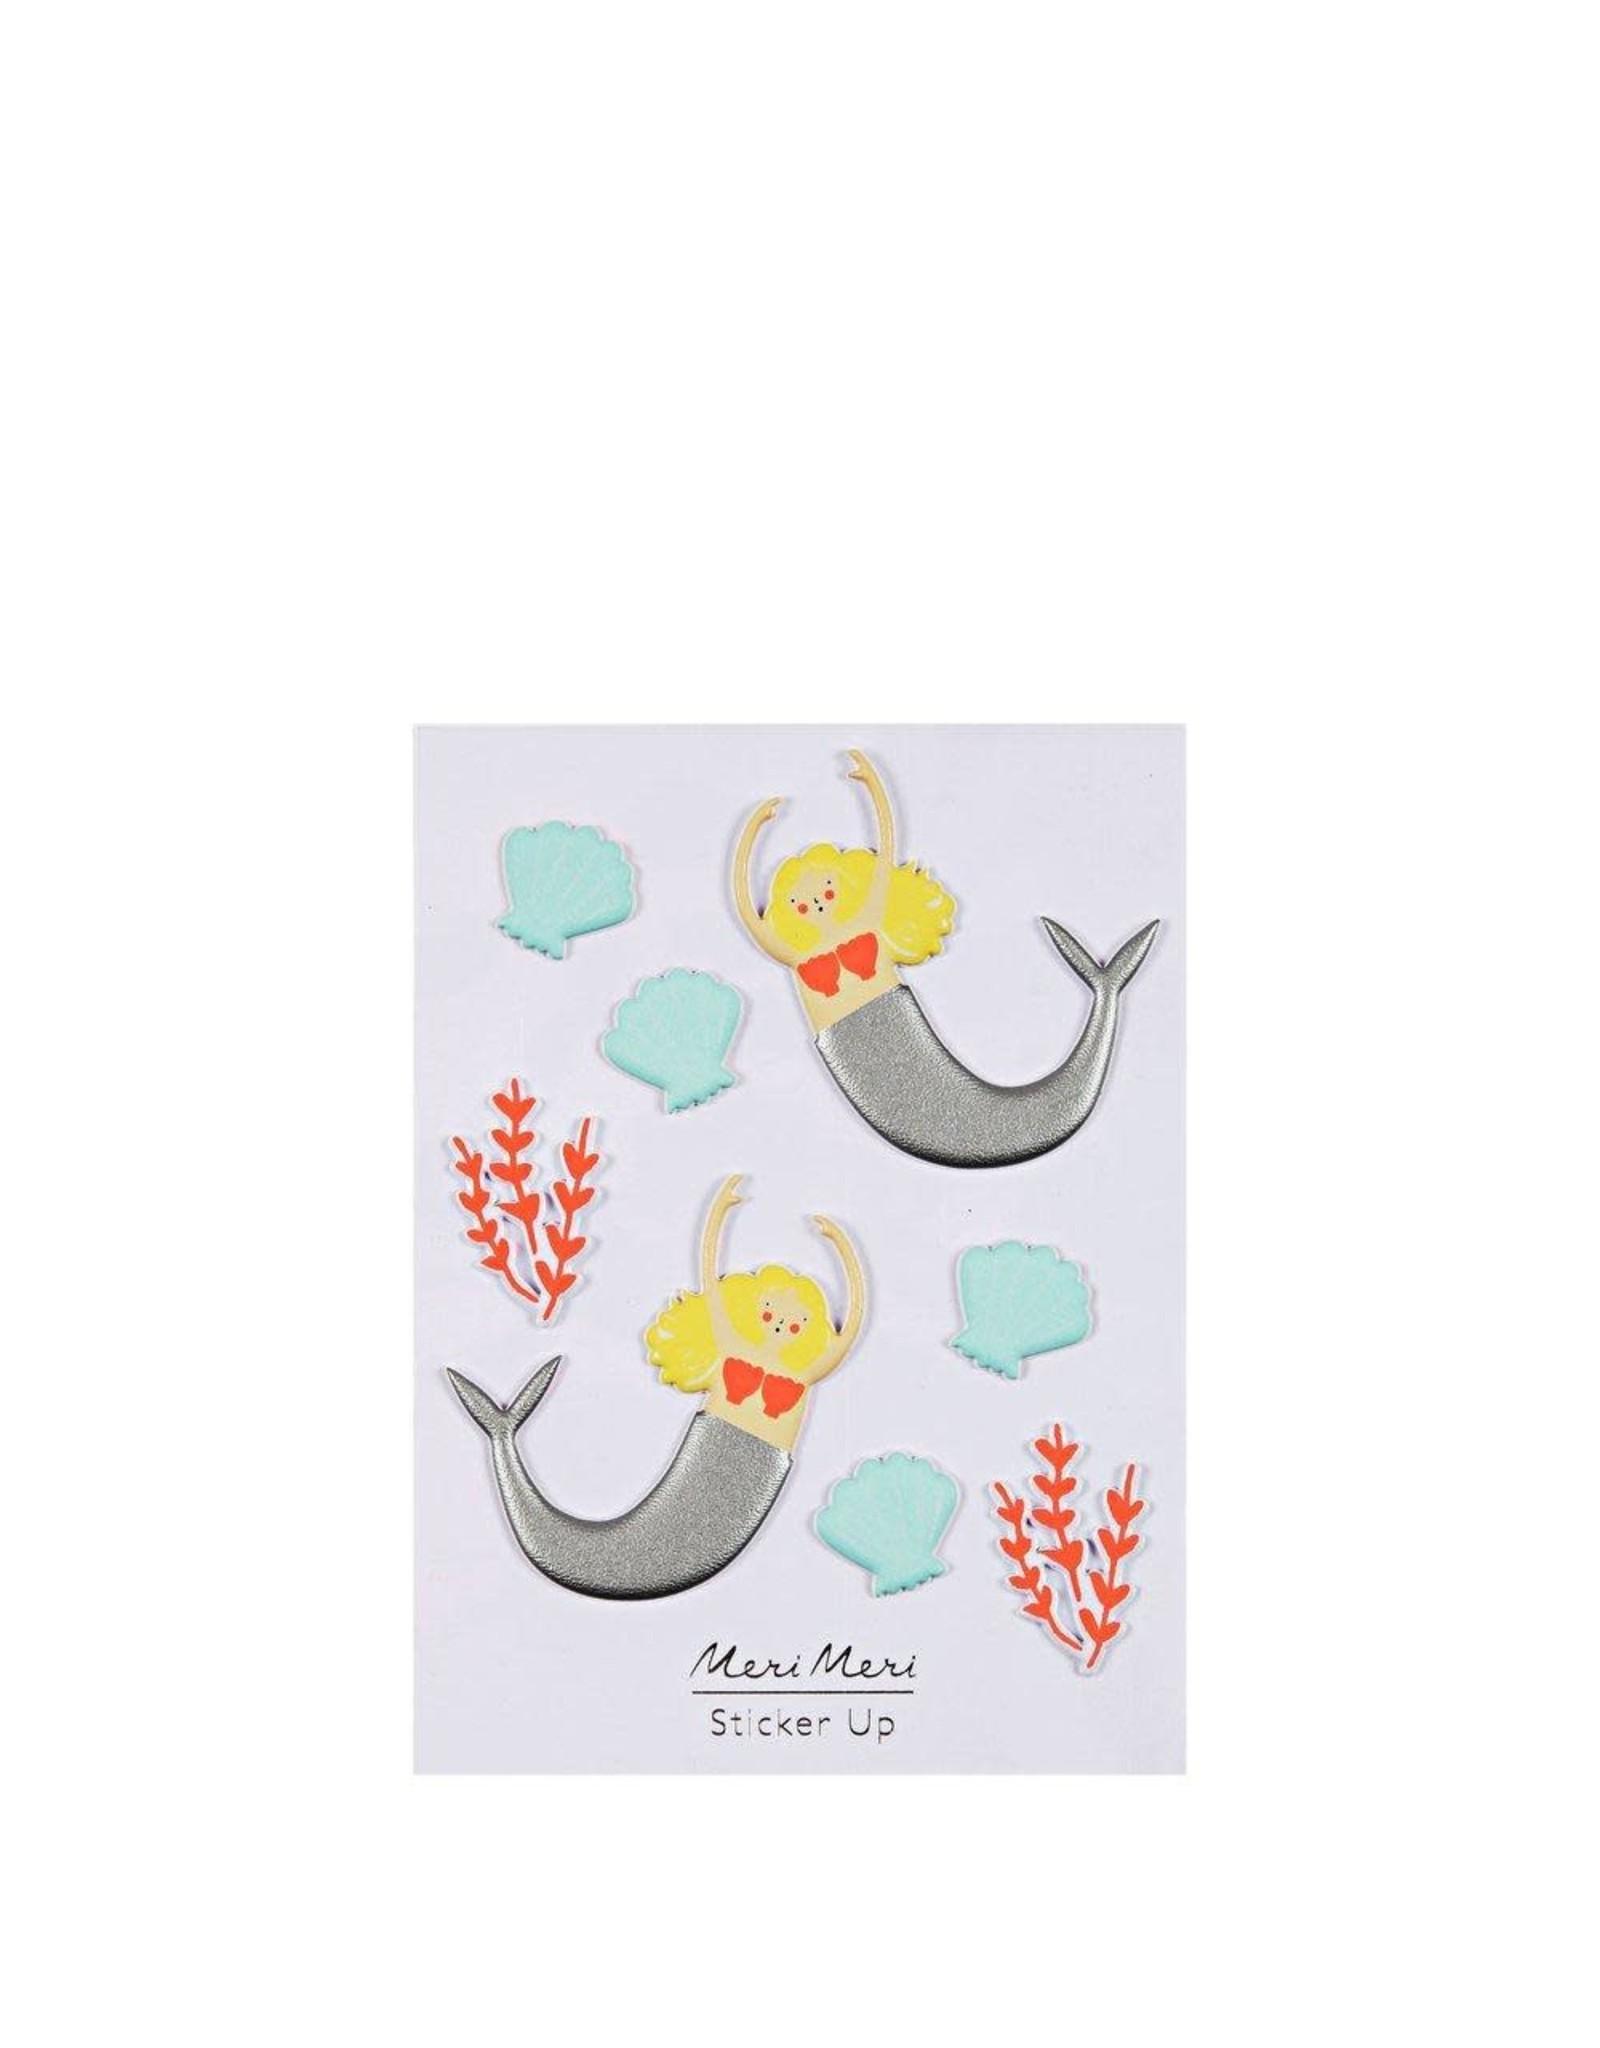 Meri Meri Sticker Up | 3D | Zeemeermin